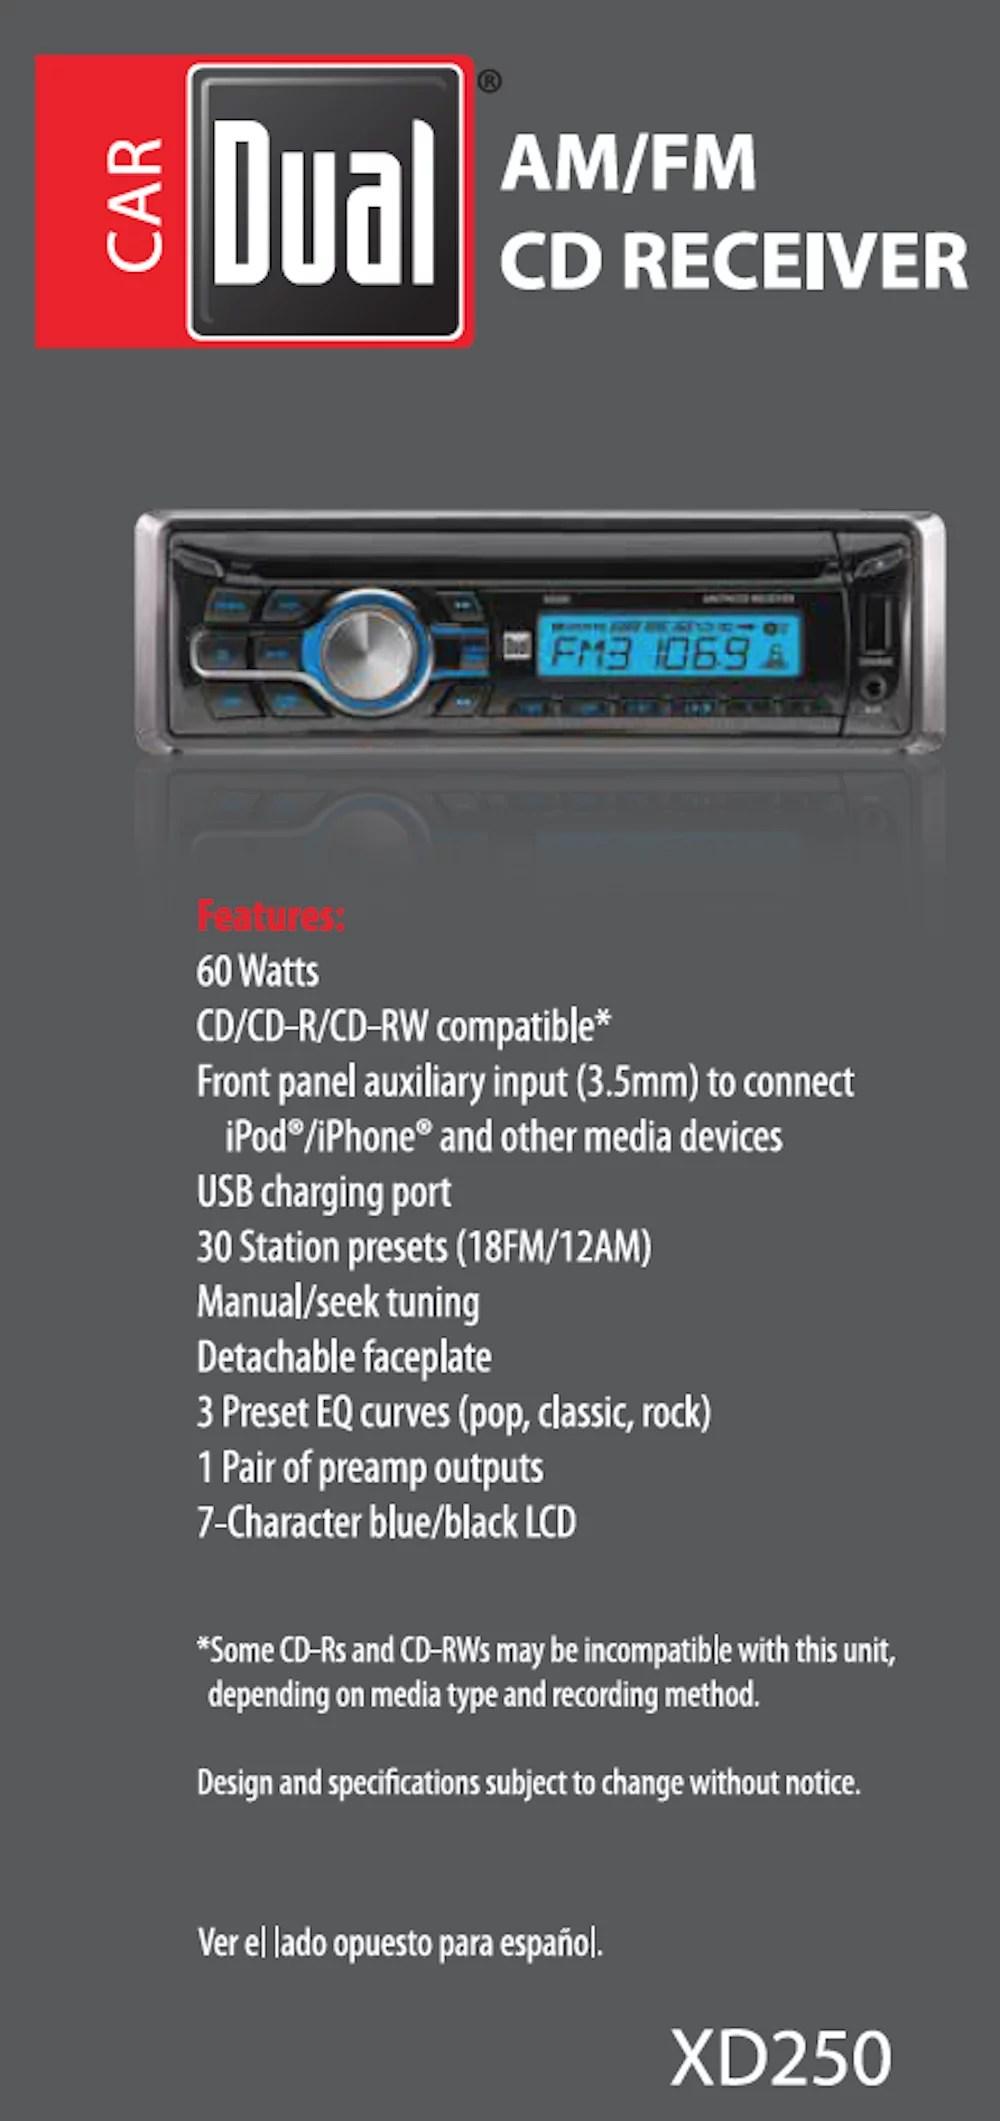 dual car stereo xdm260 wiring harness auto stereo harness 97 dodge dakota wiring diagram 97 mercury [ 1000 x 2121 Pixel ]